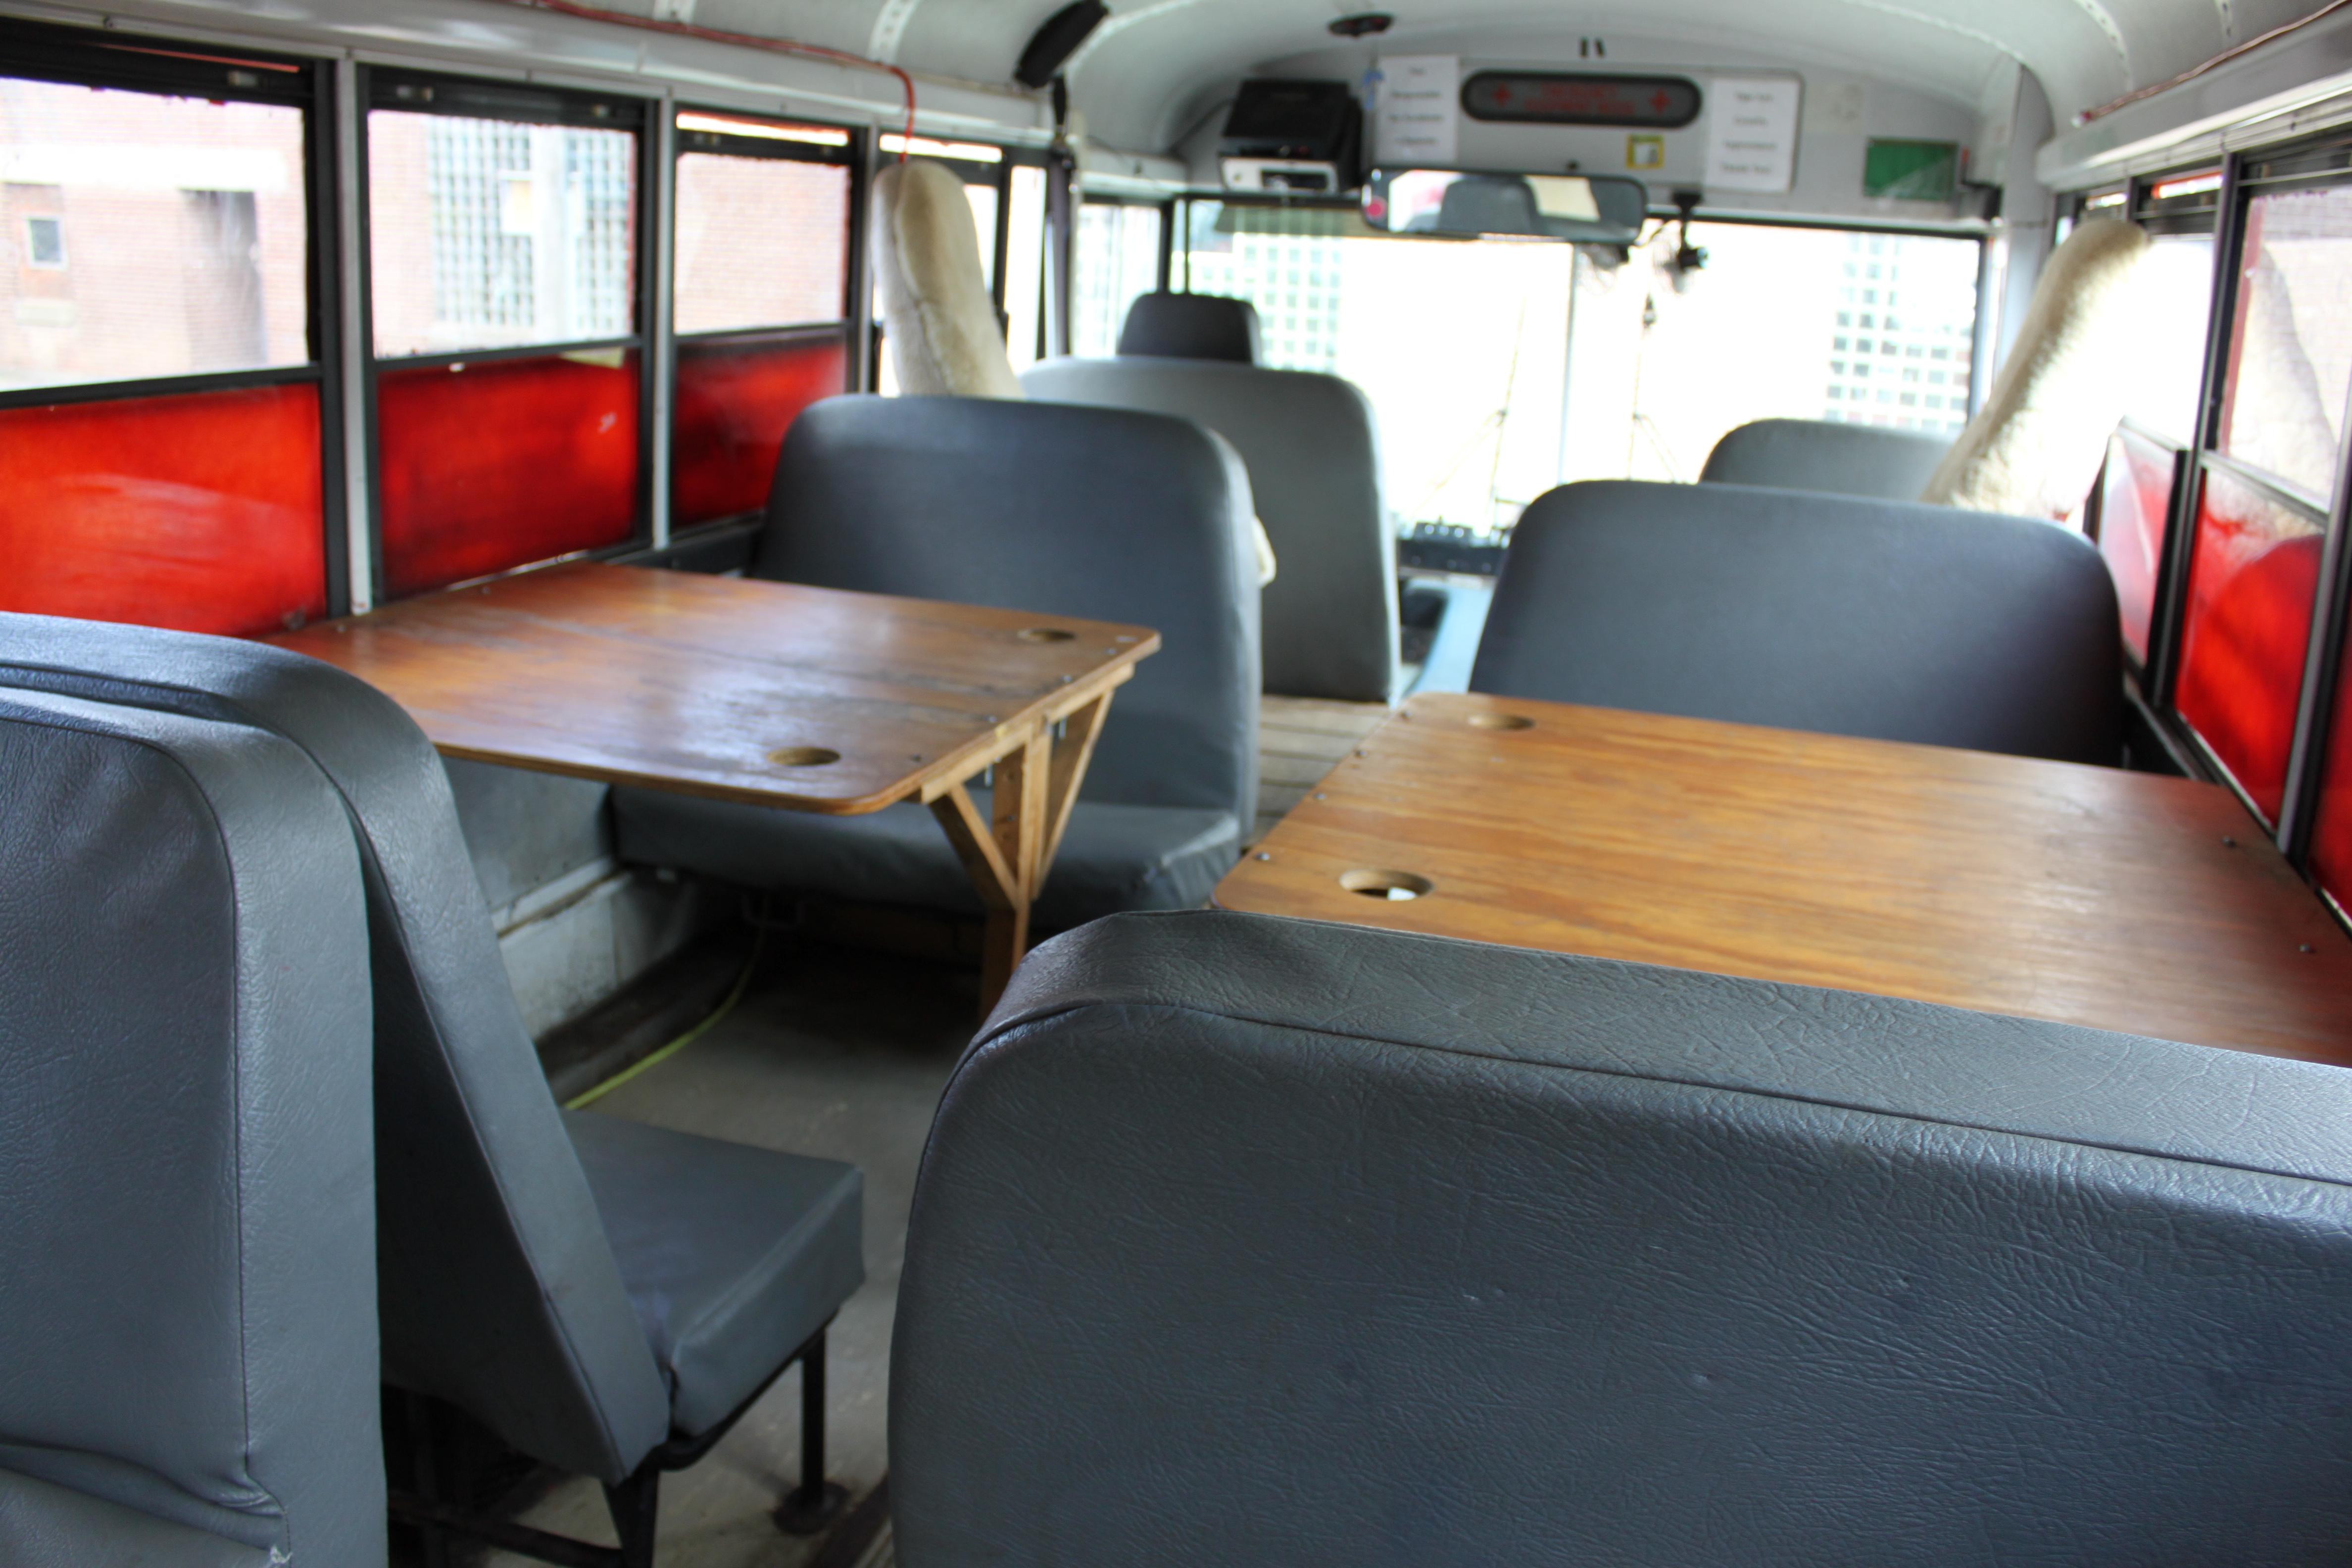 30-passenger bus